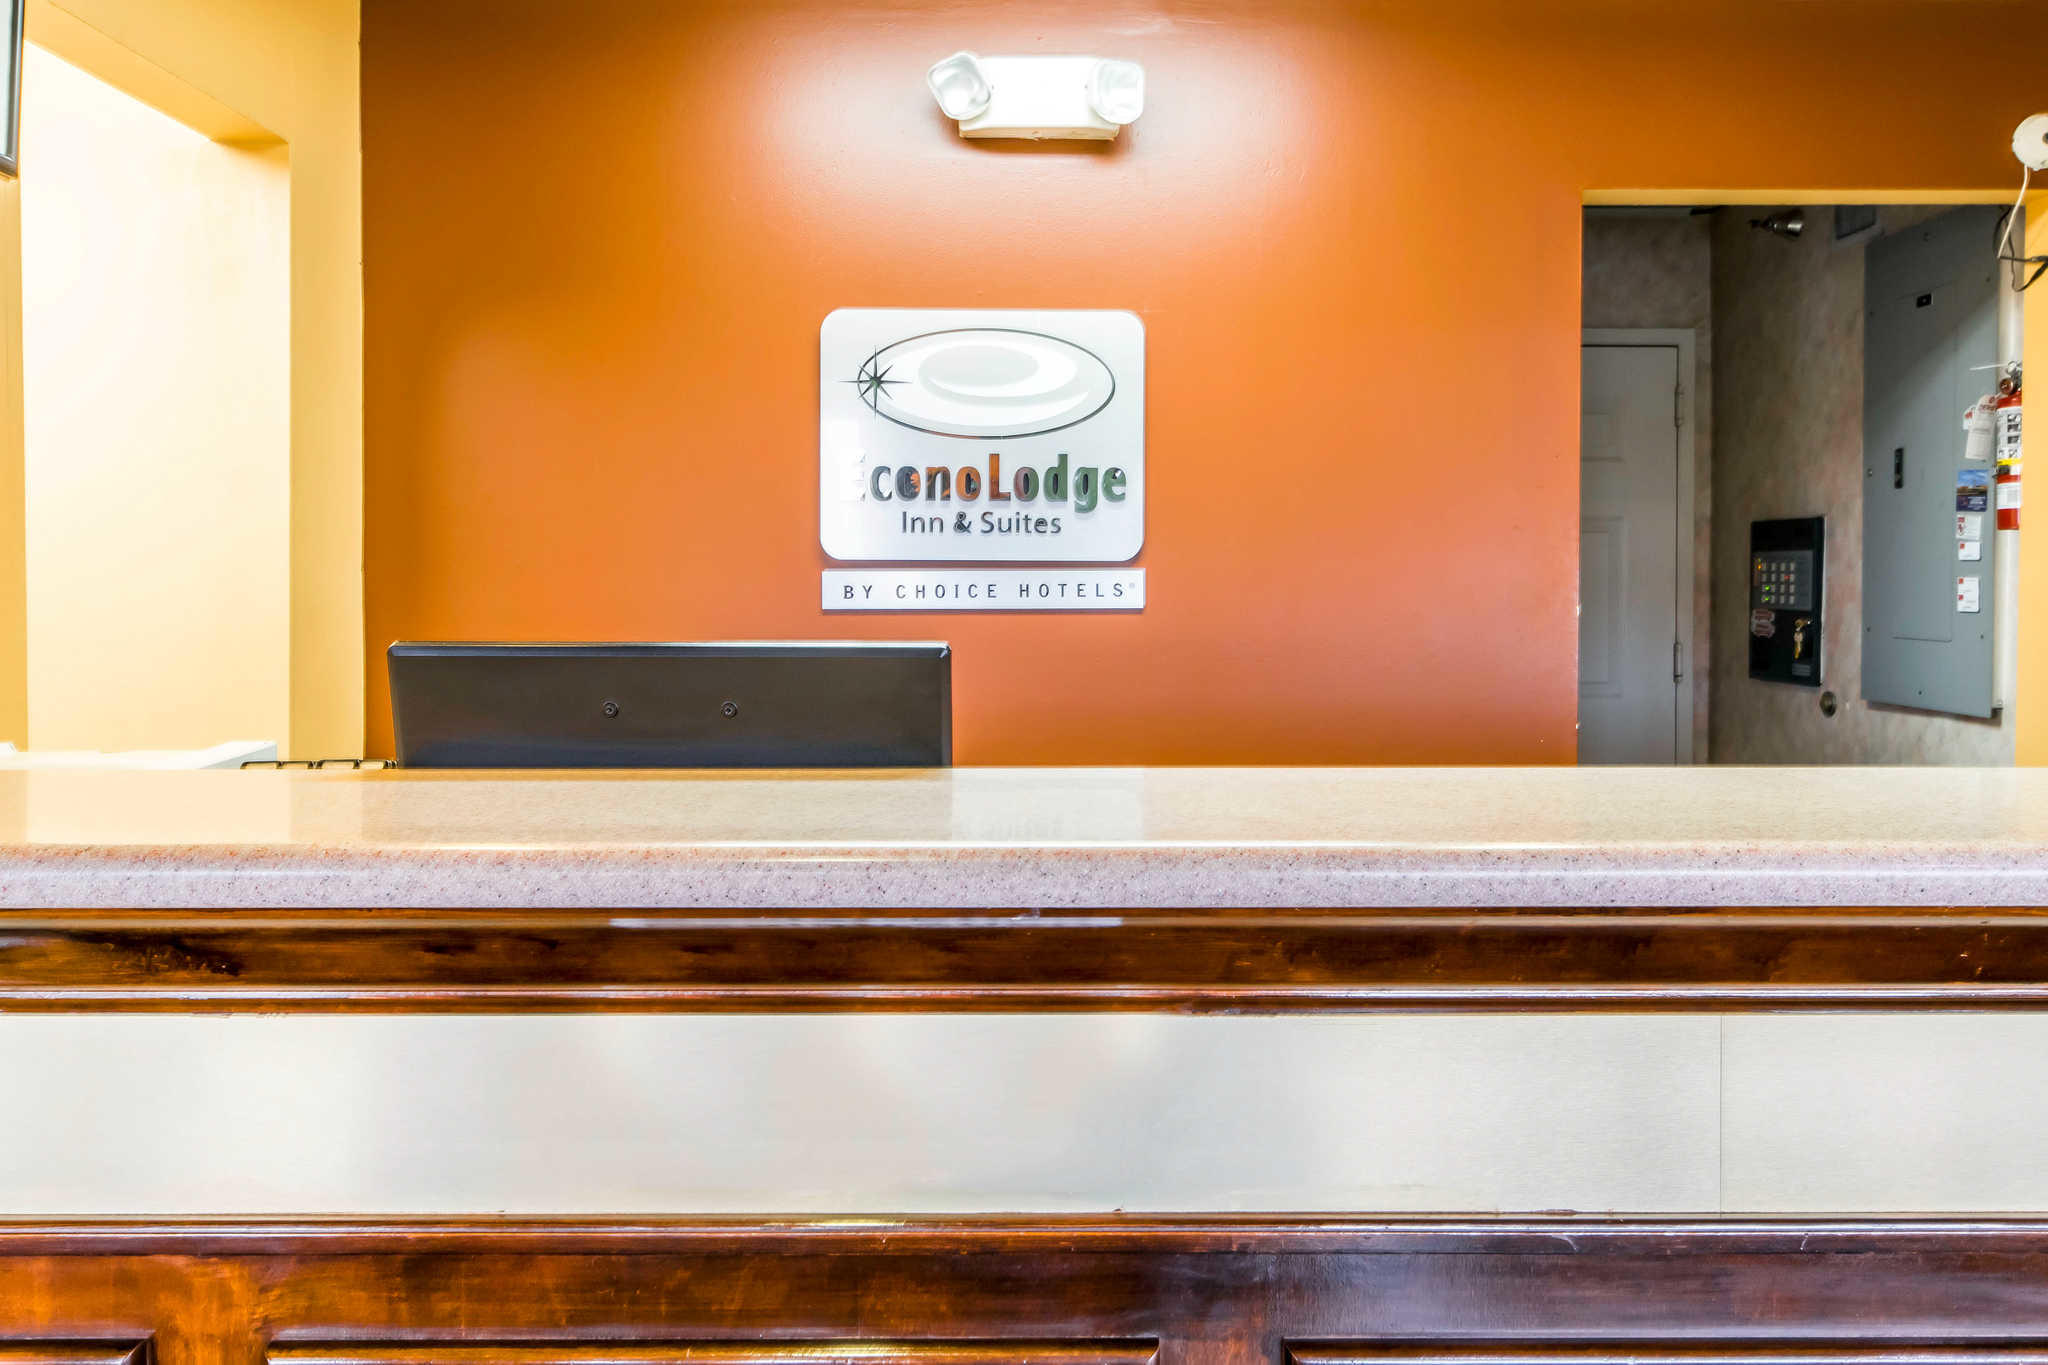 Econo Lodge Inn & Suites I-65 image 3